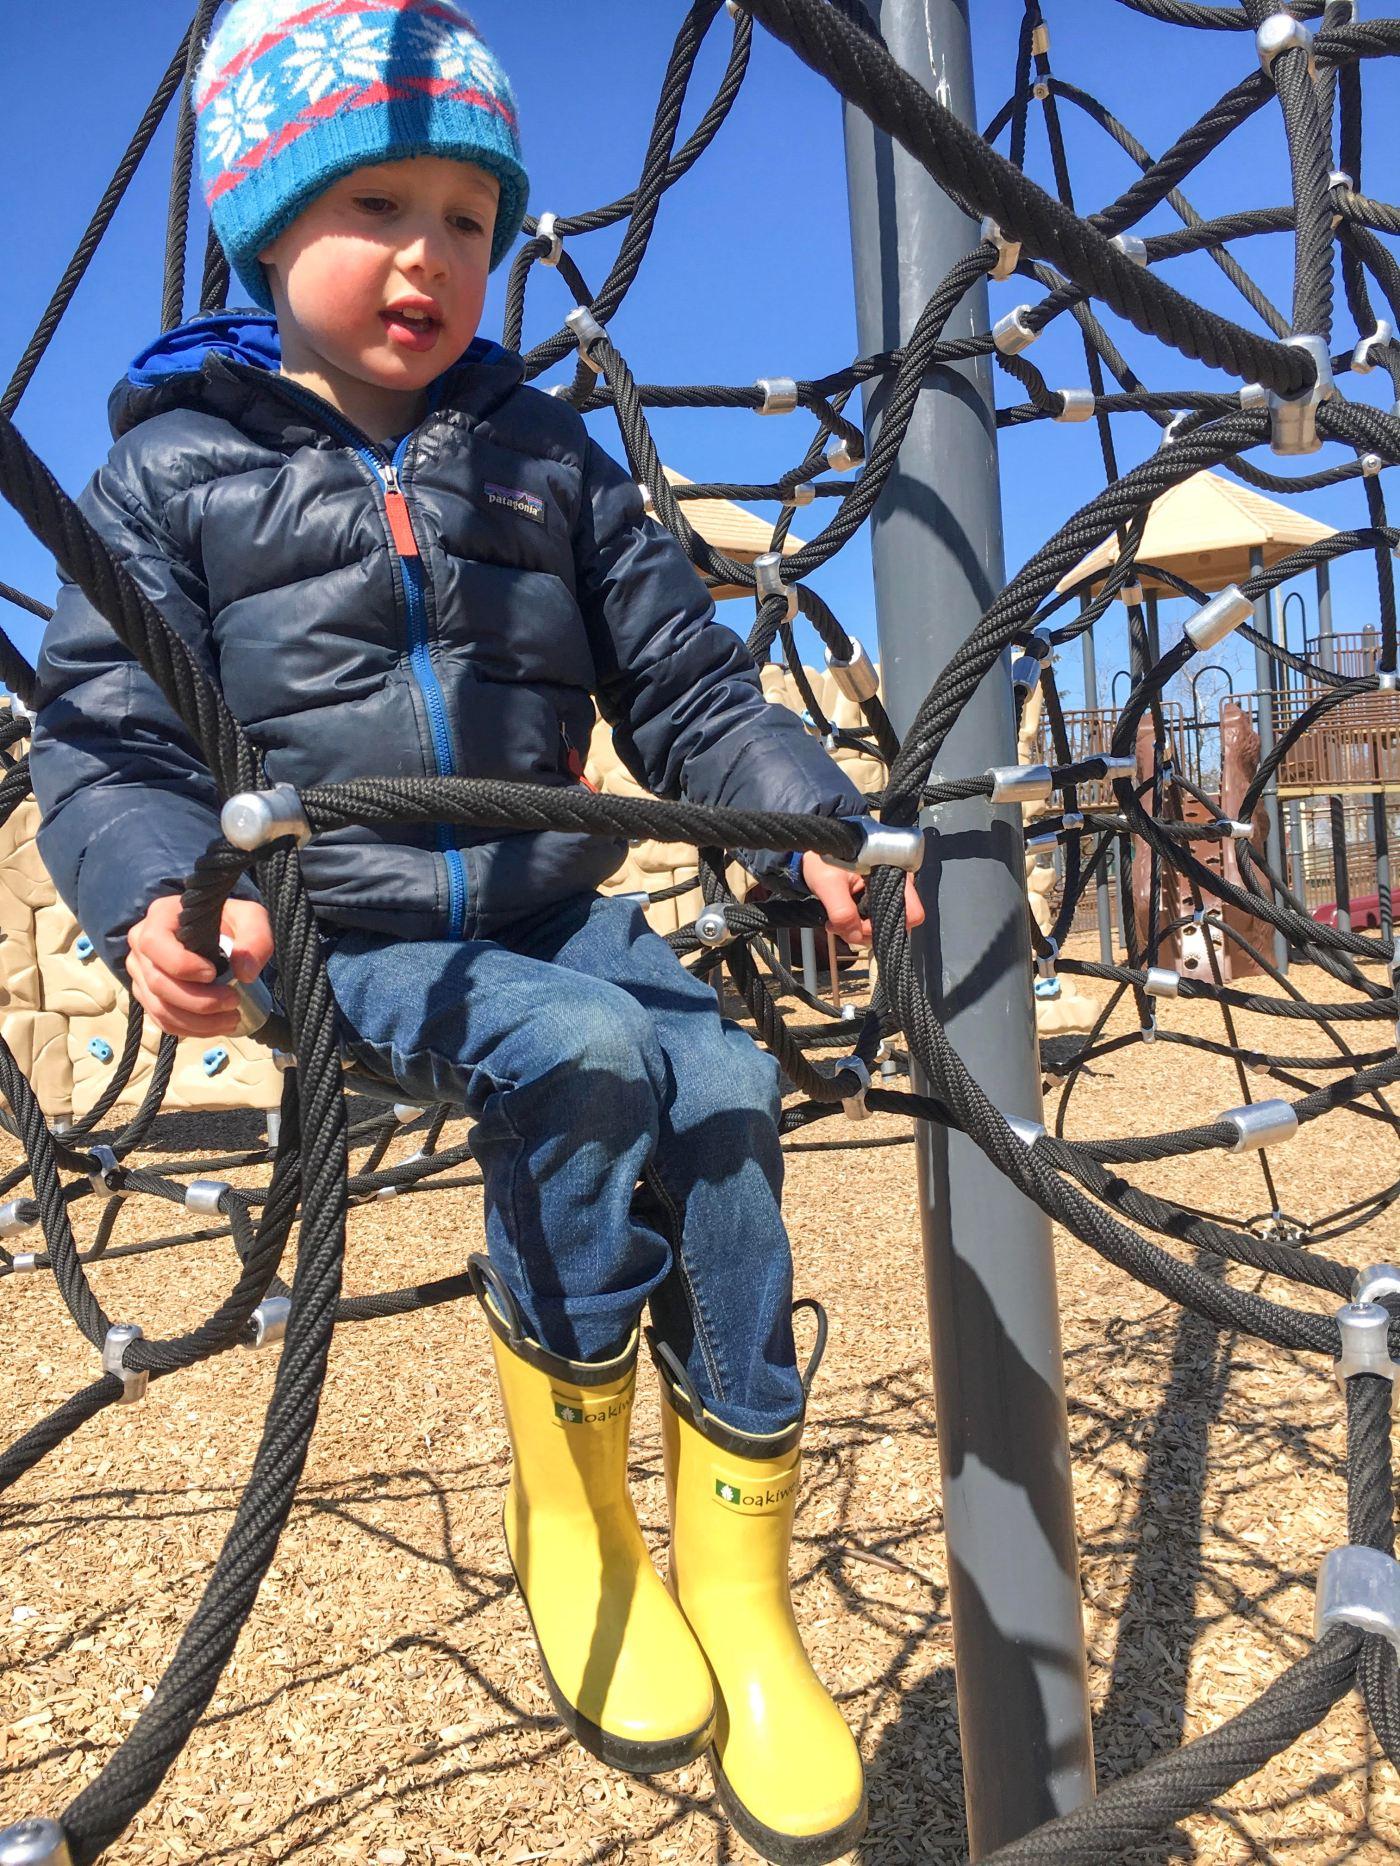 Oakiwear Boots at playground.jpg